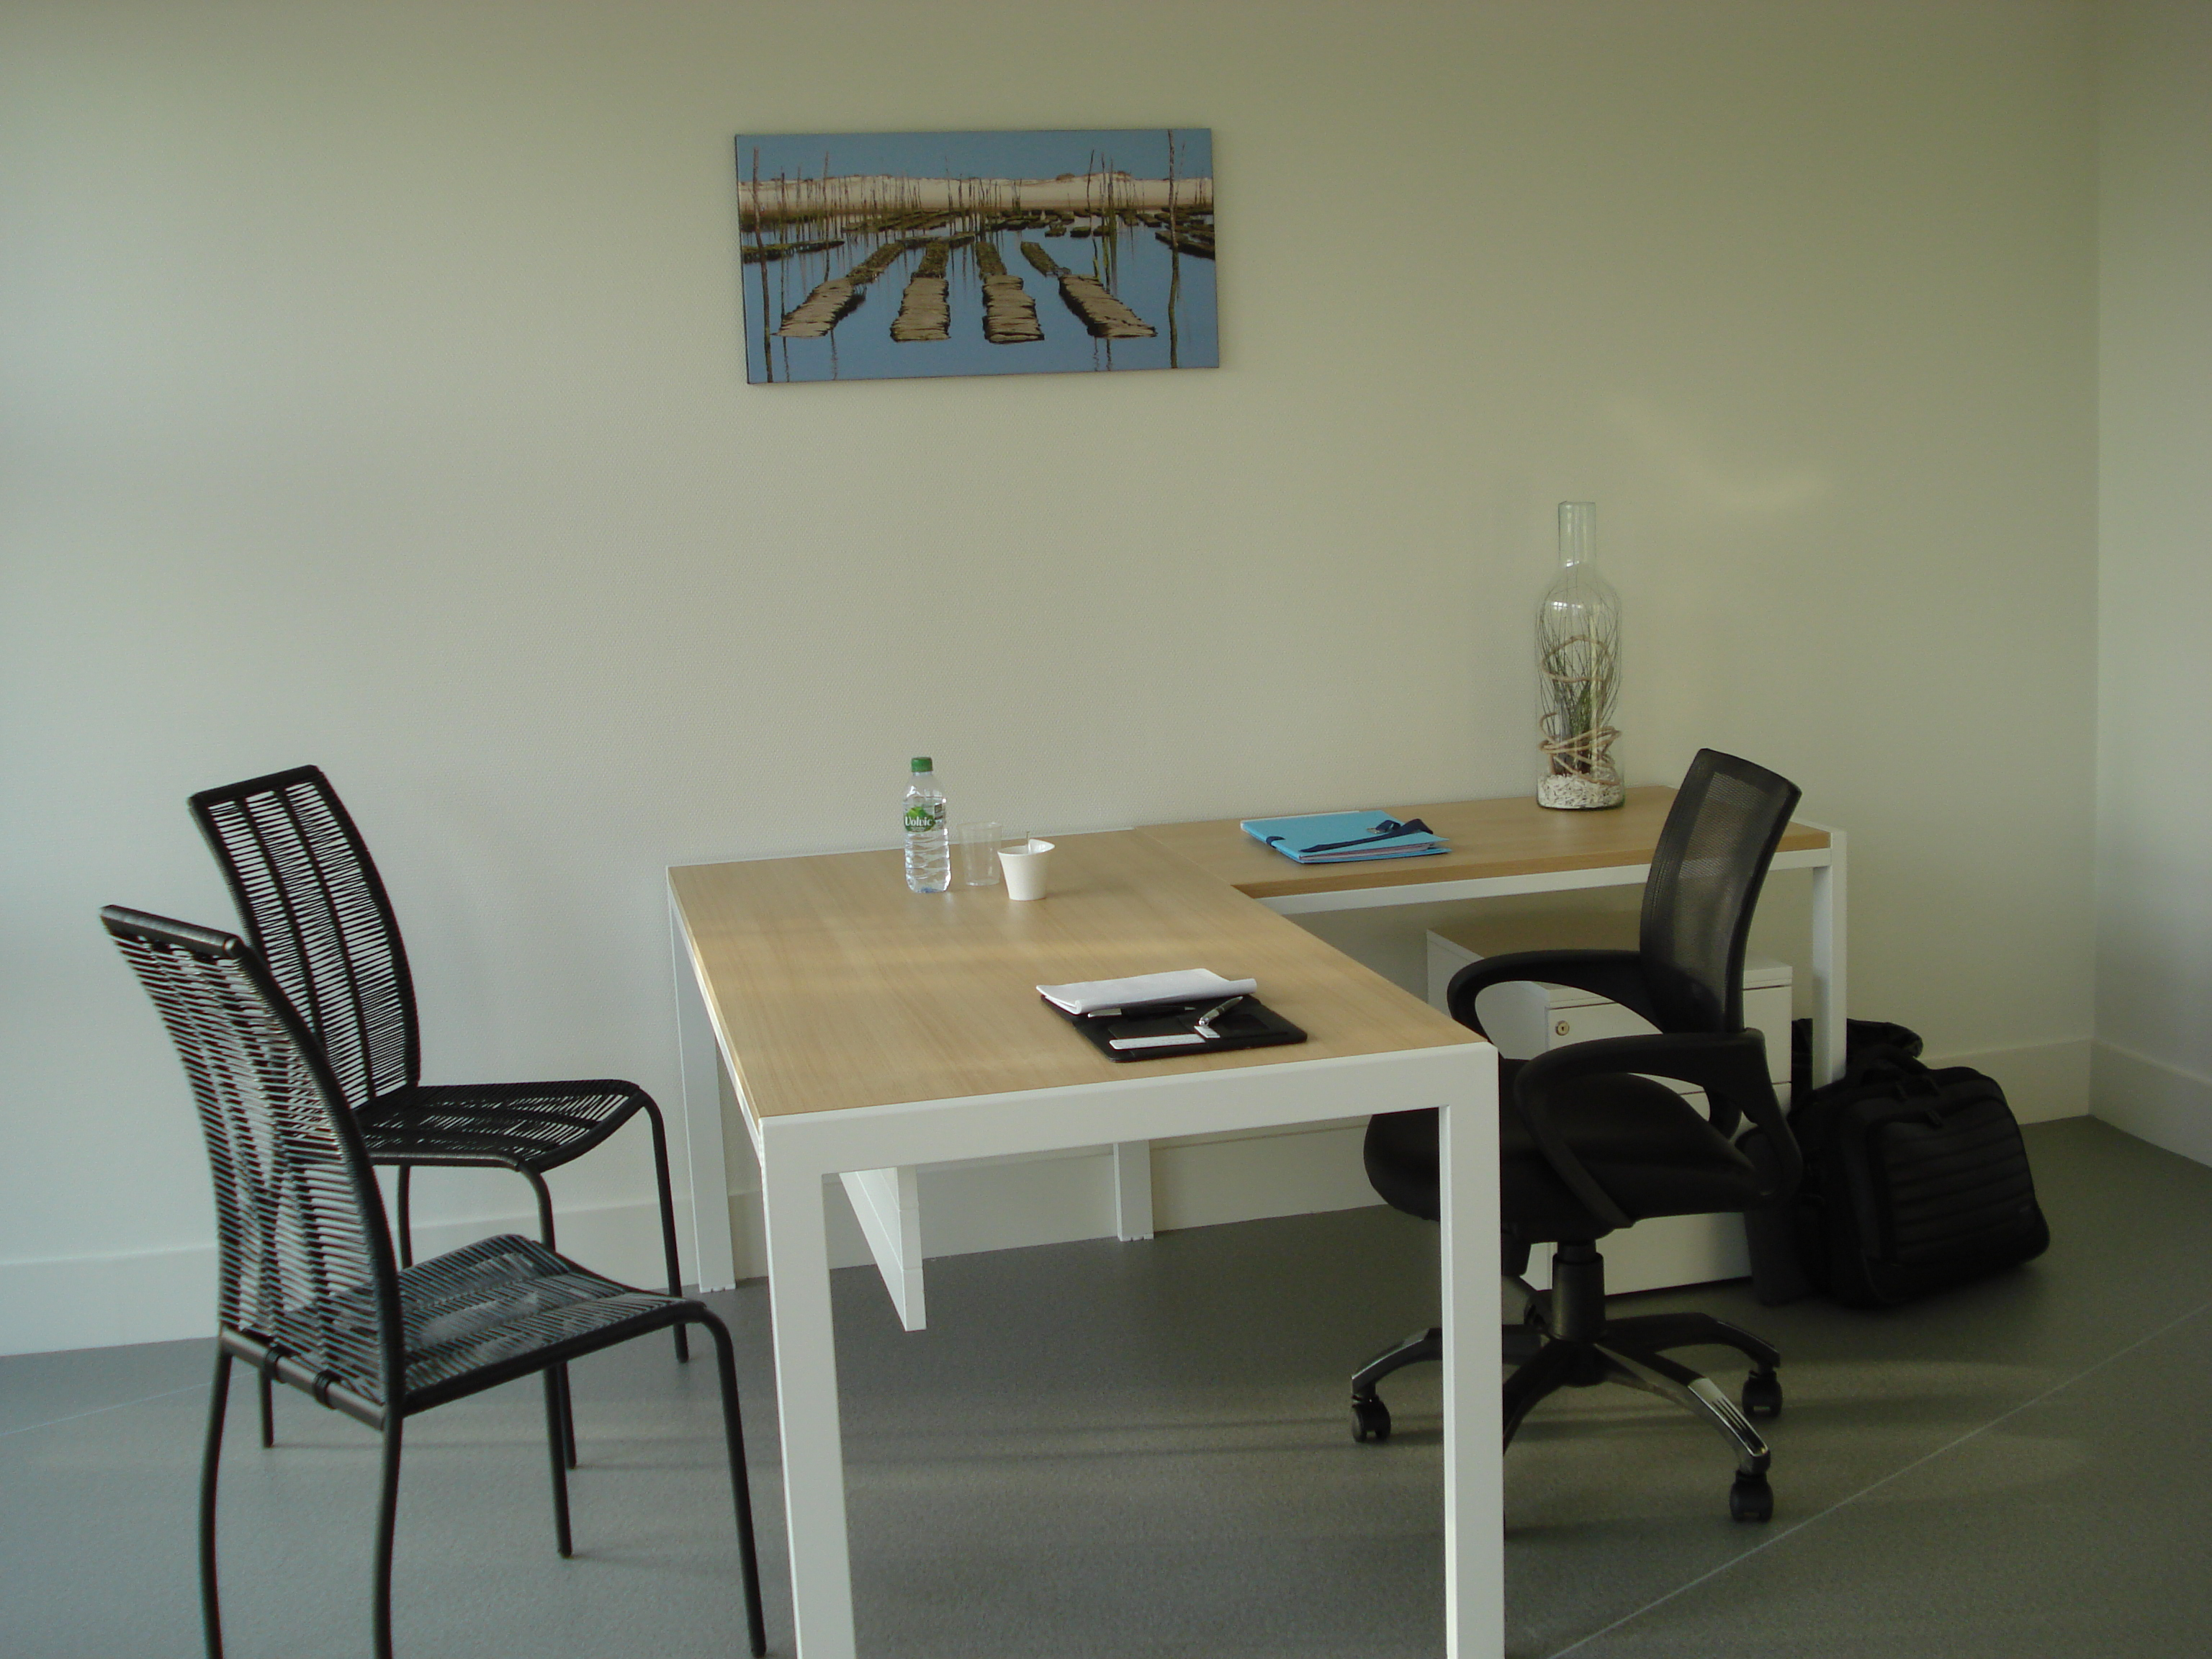 Ewu u bureaux en location à poitiers